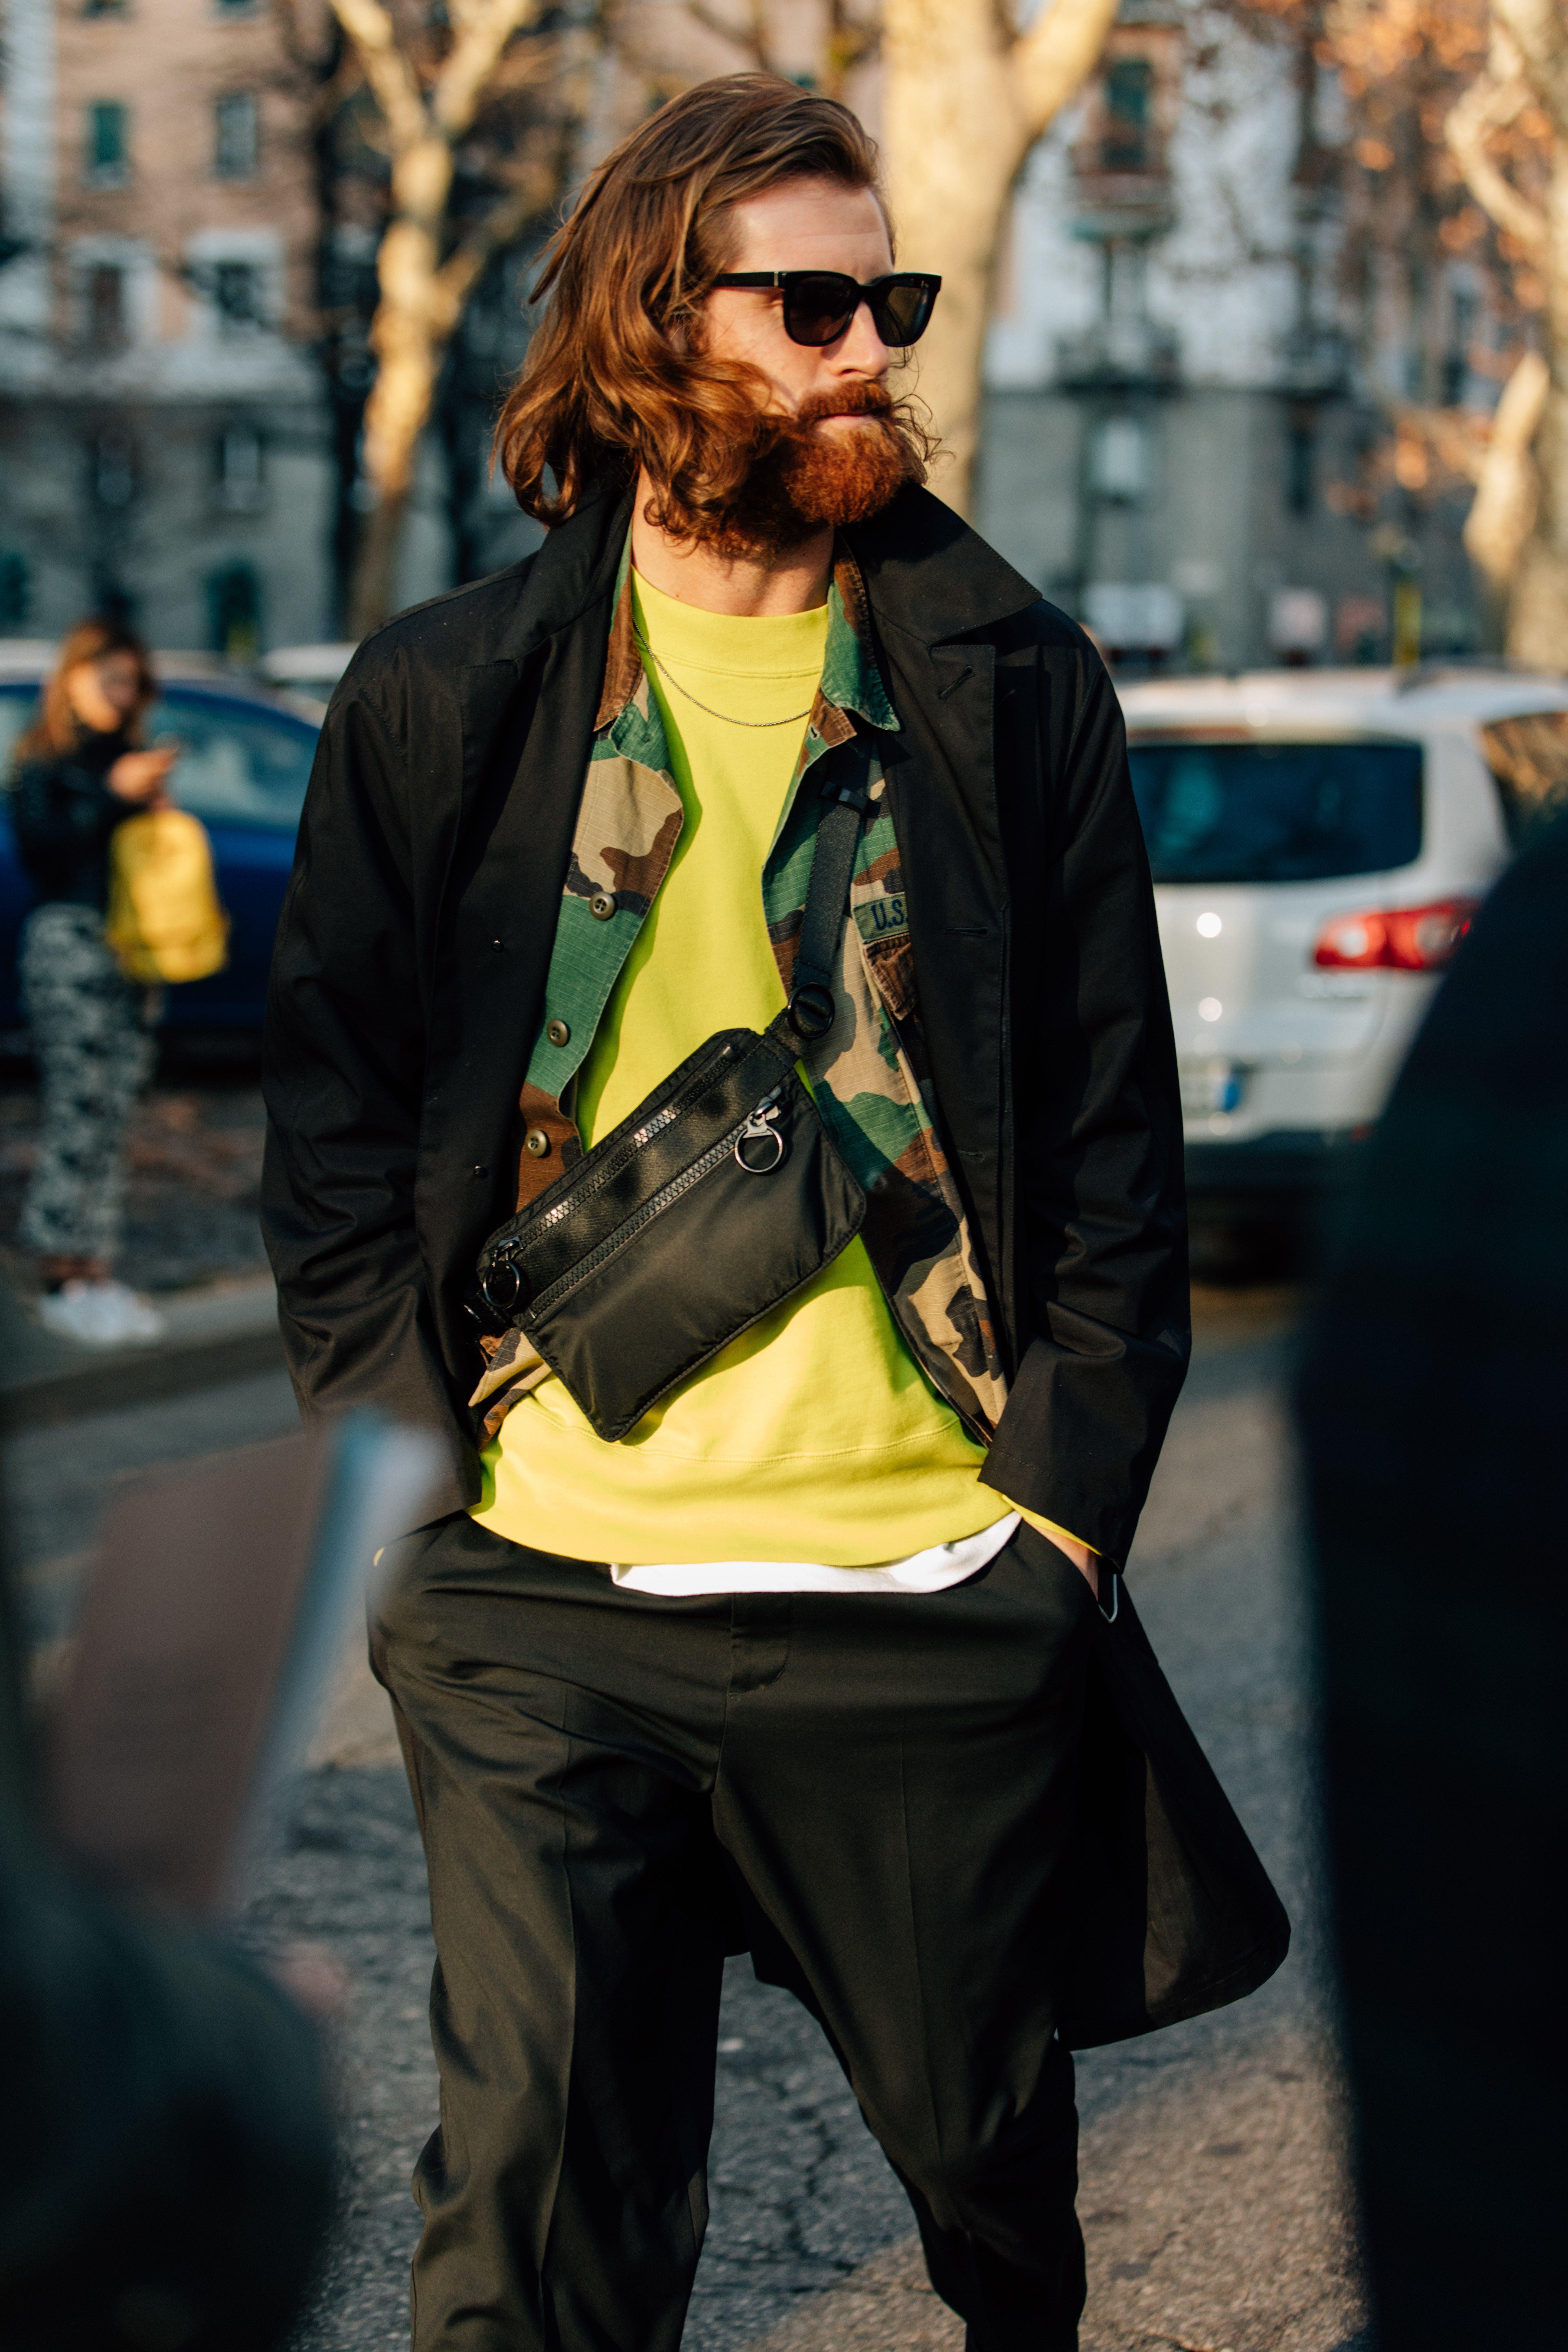 0b8f25fe410ef The Best Street Style from Milan Fashion Week (So Far)